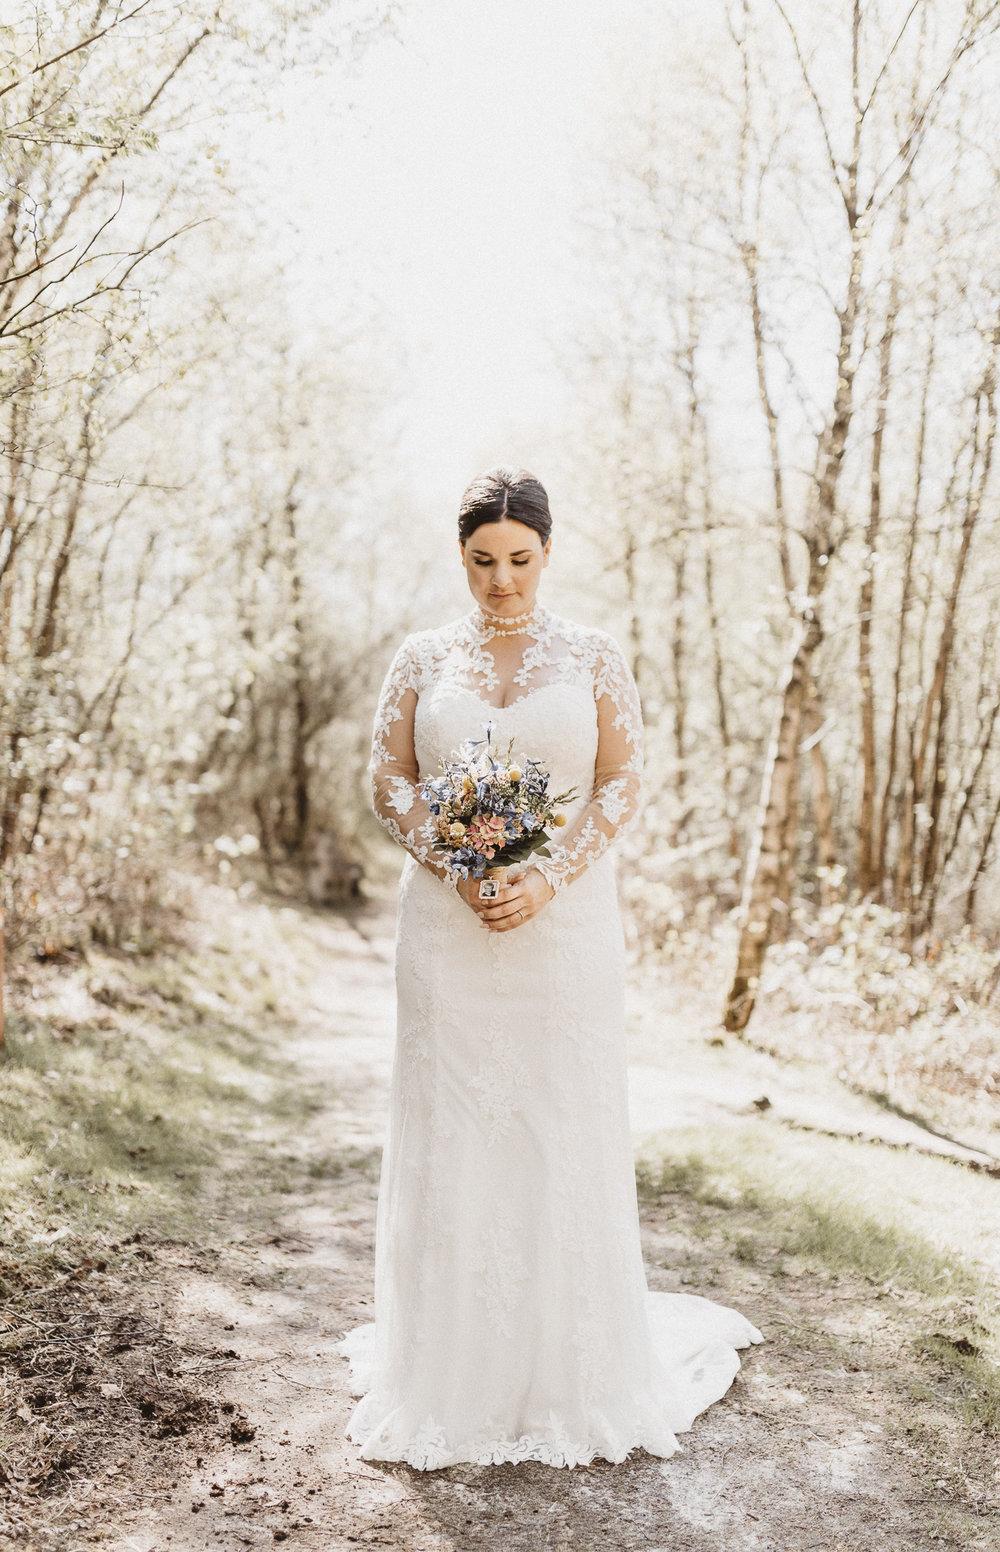 Bryllup-WEB-050518-147.jpg